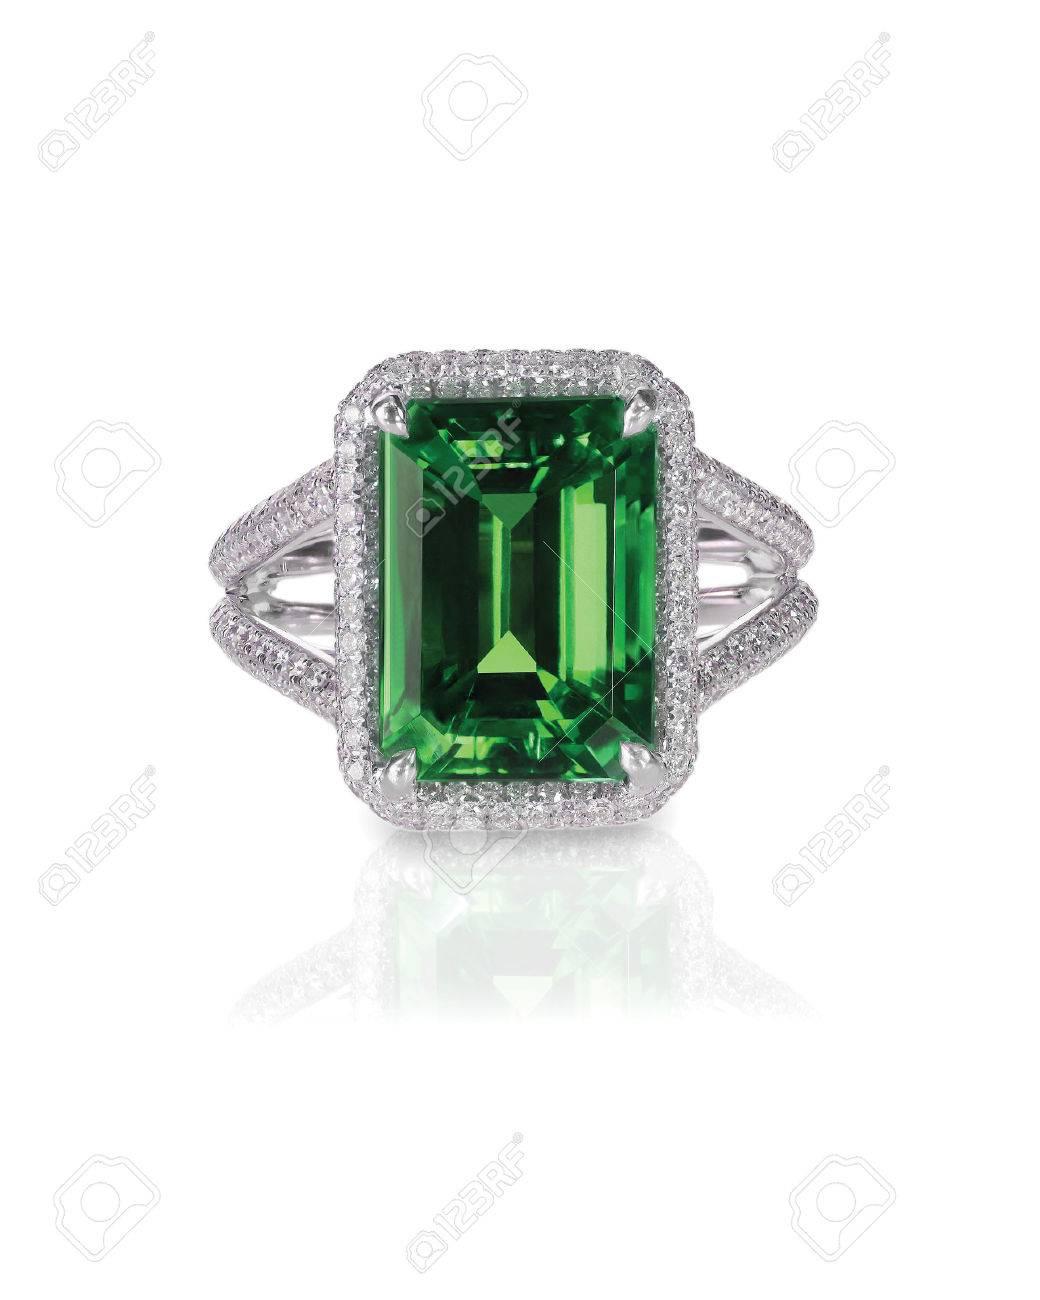 green emerald fashion engagement diamond ring band isolated on white - 54801829